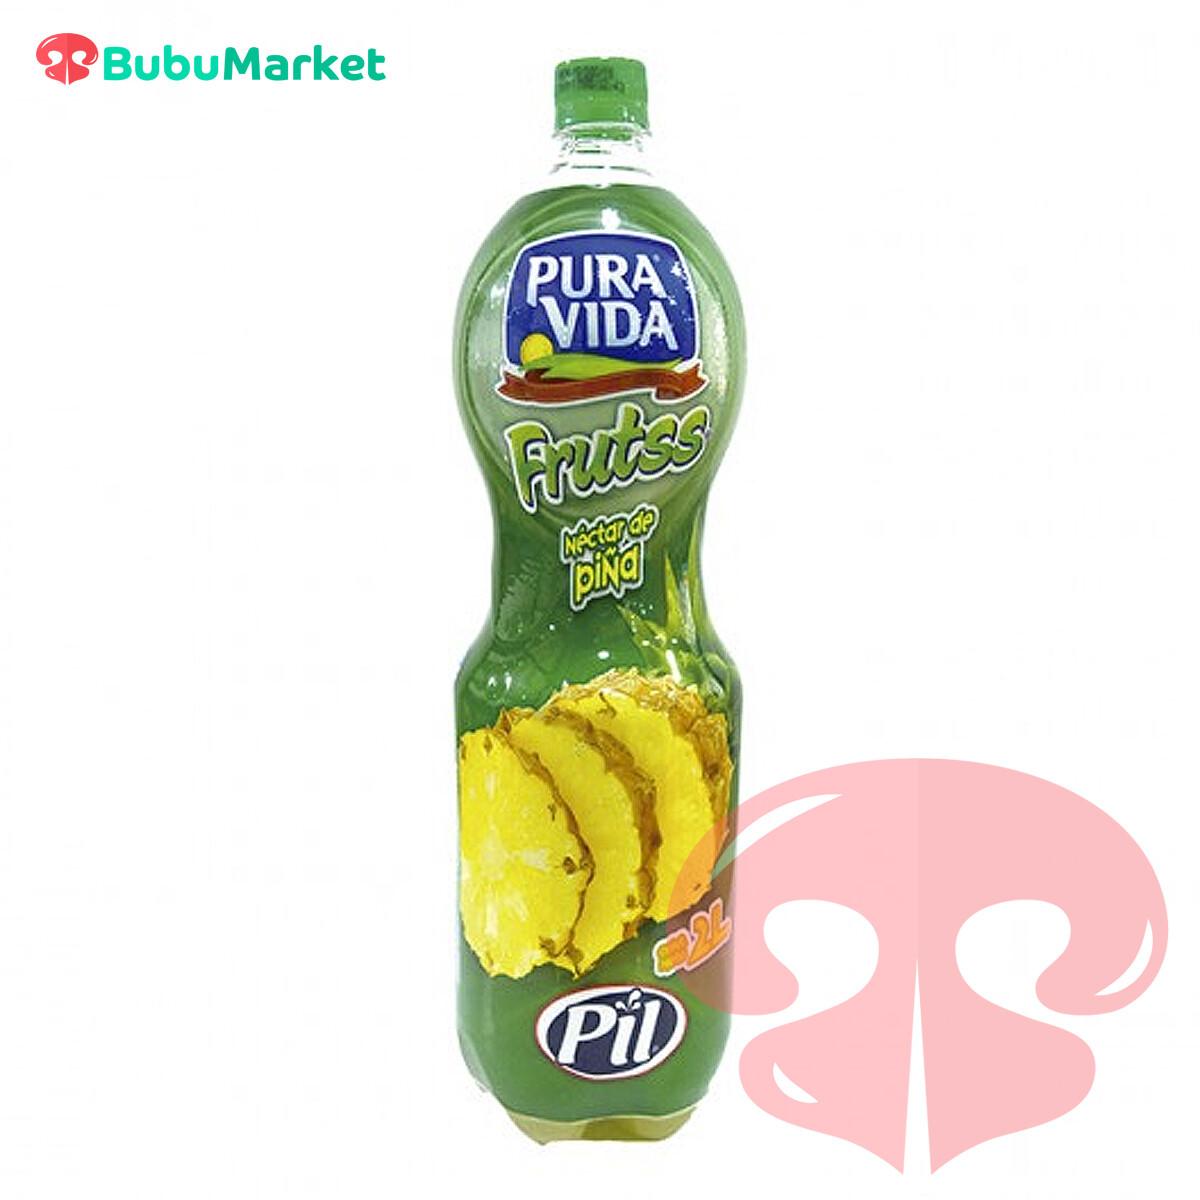 NECTAR PIÑA PURA VIDA PIL BOTELLA 2 L.